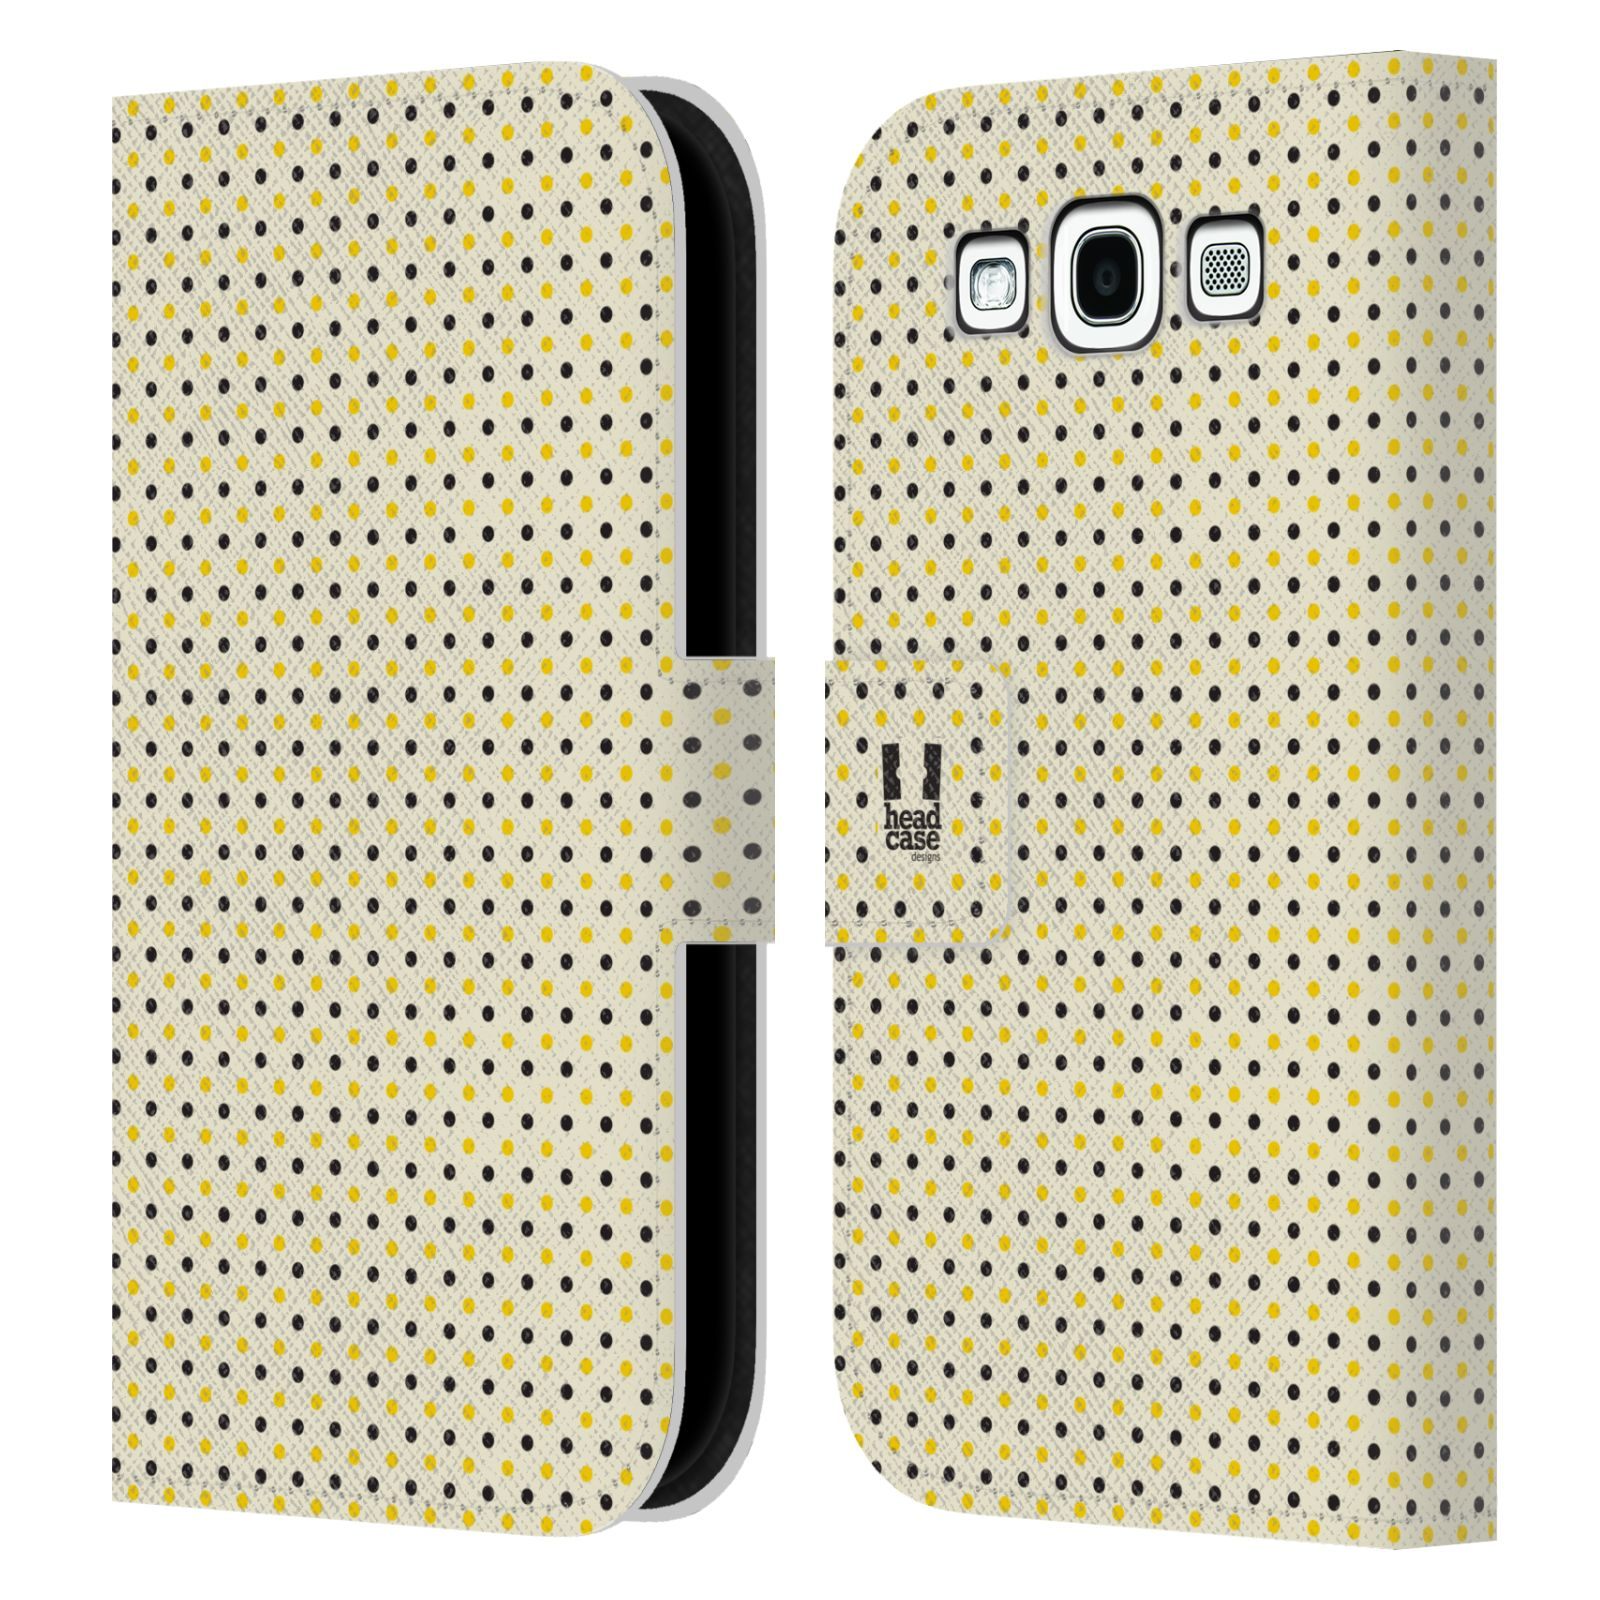 HEAD CASE Flipové pouzdro pro mobil Samsung Galaxy S3 VČELÍ VZOR tečky a puntíky